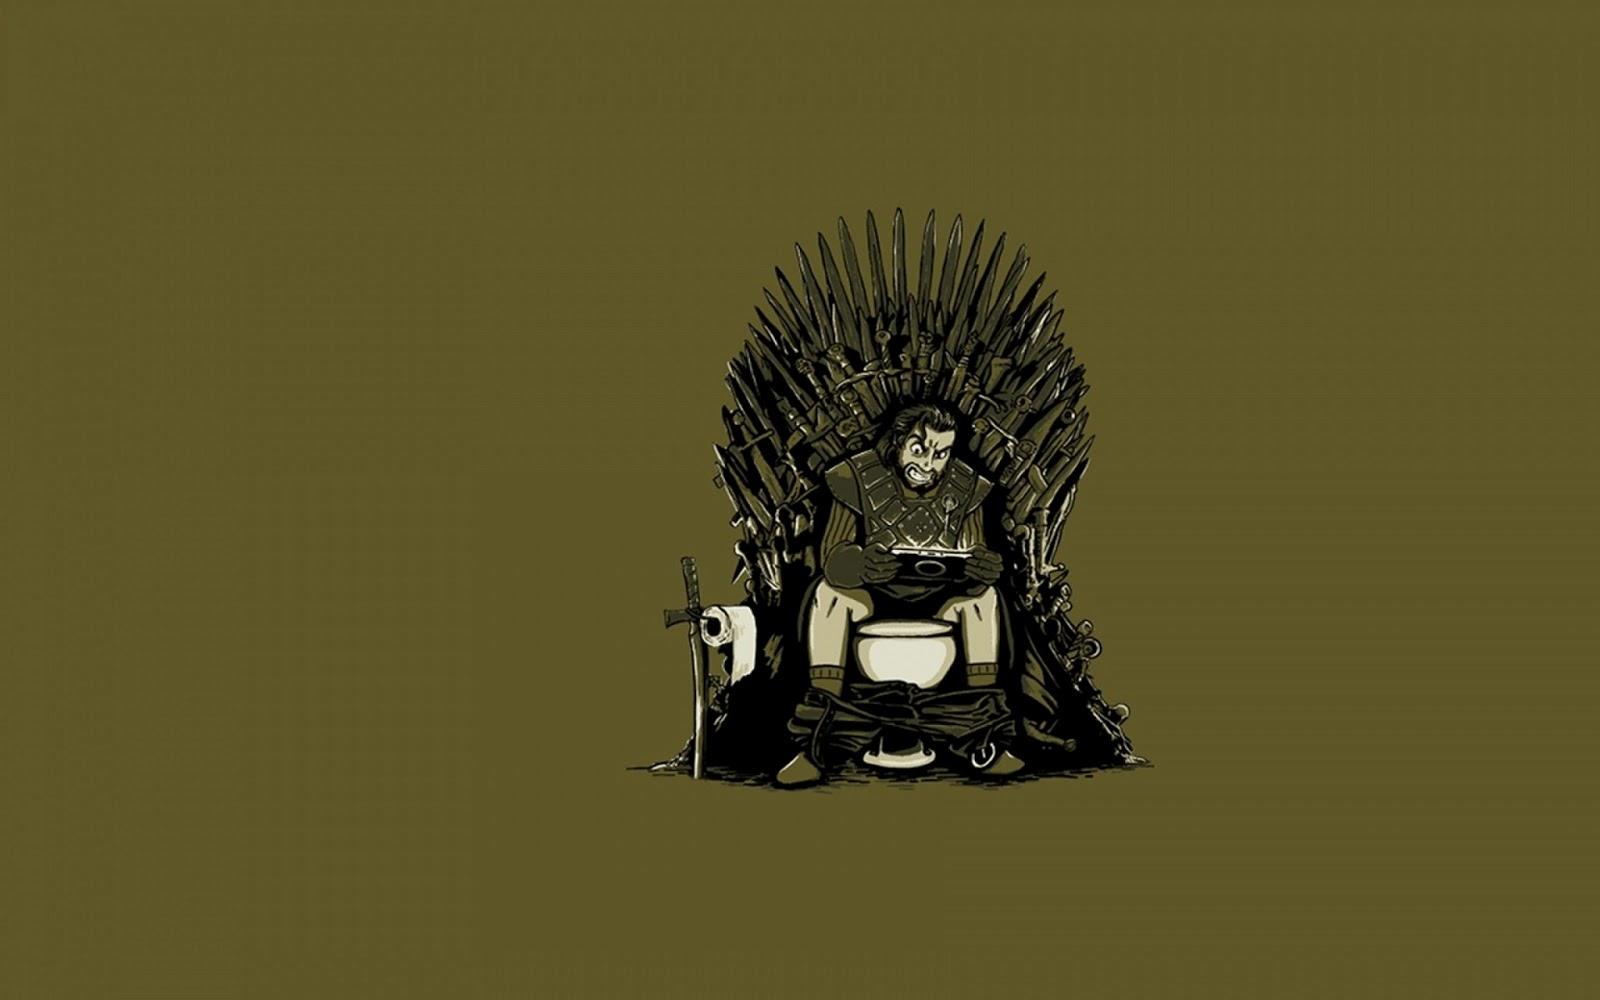 Game of thrones - Fun art   HD Cartoons Wallpapers